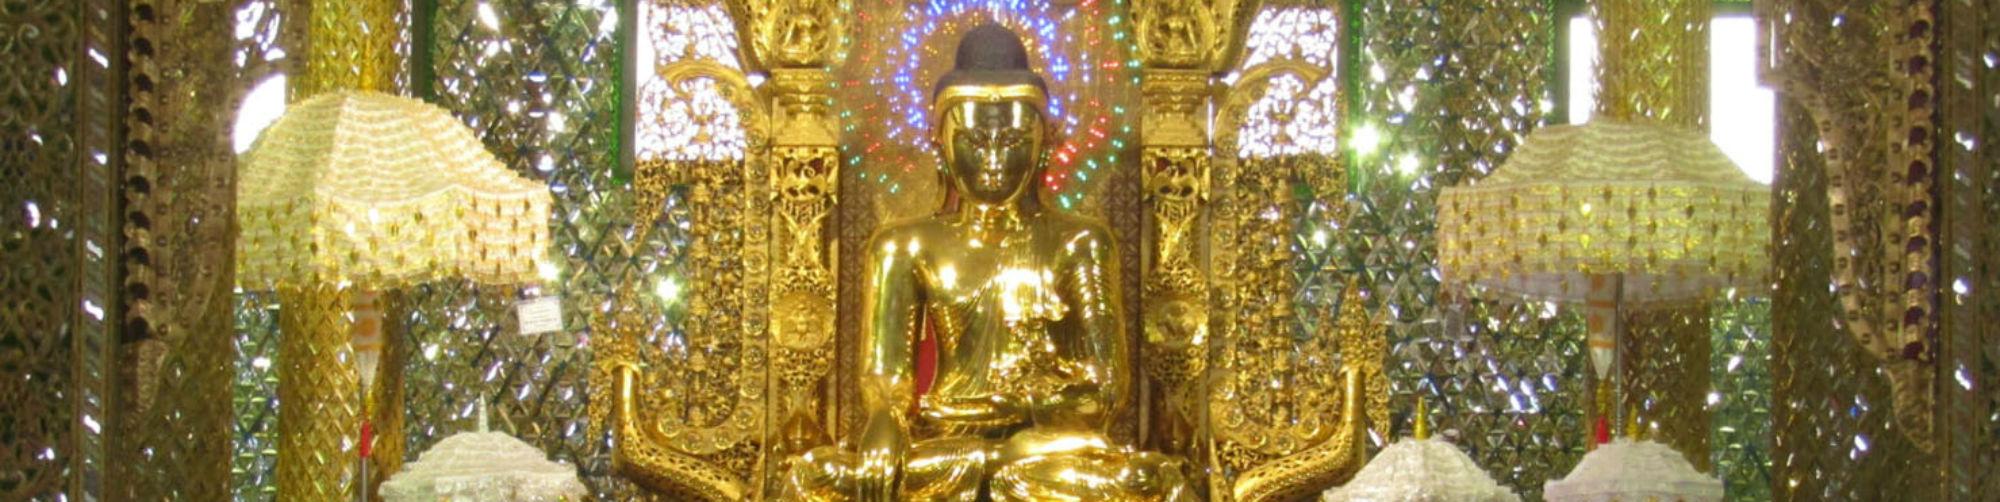 Royal Palace Bronze Image, Botahtaung Pagoda, Botahtaung, Yangon